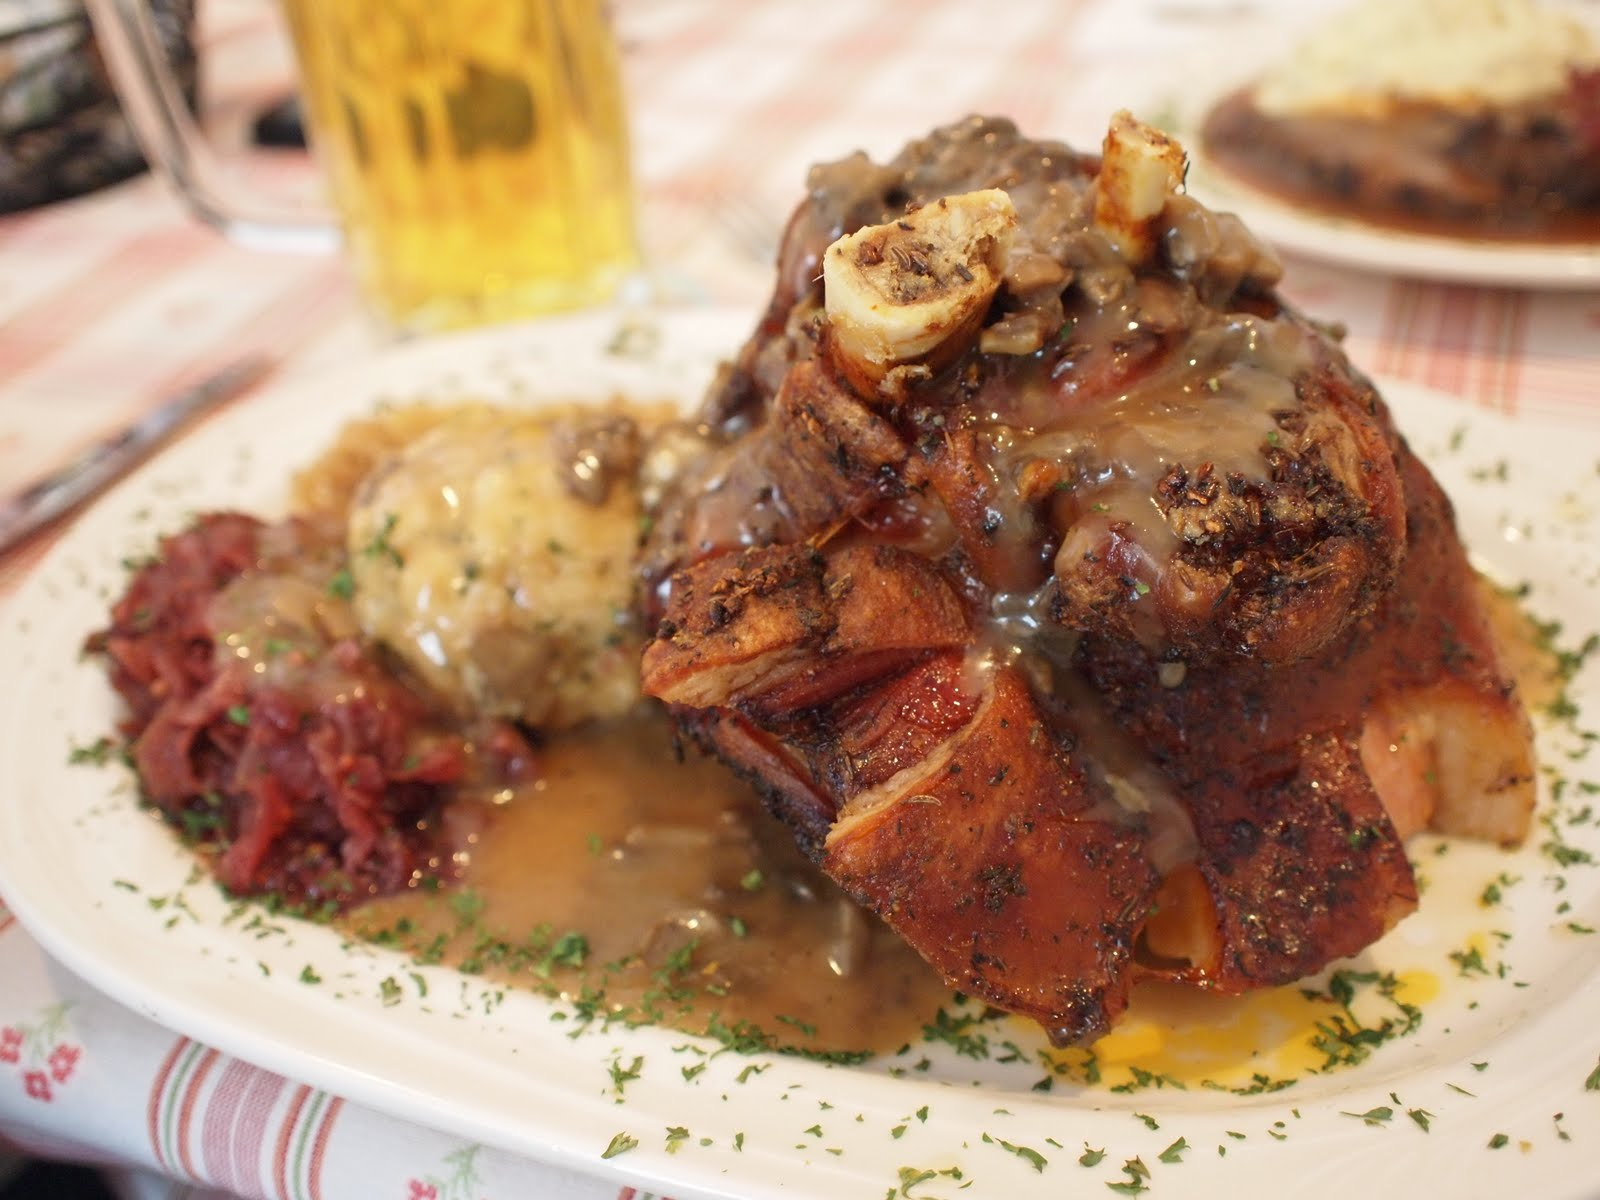 This Is Gonna Be Good Schmankerl Stube Bavarian Restaurant In